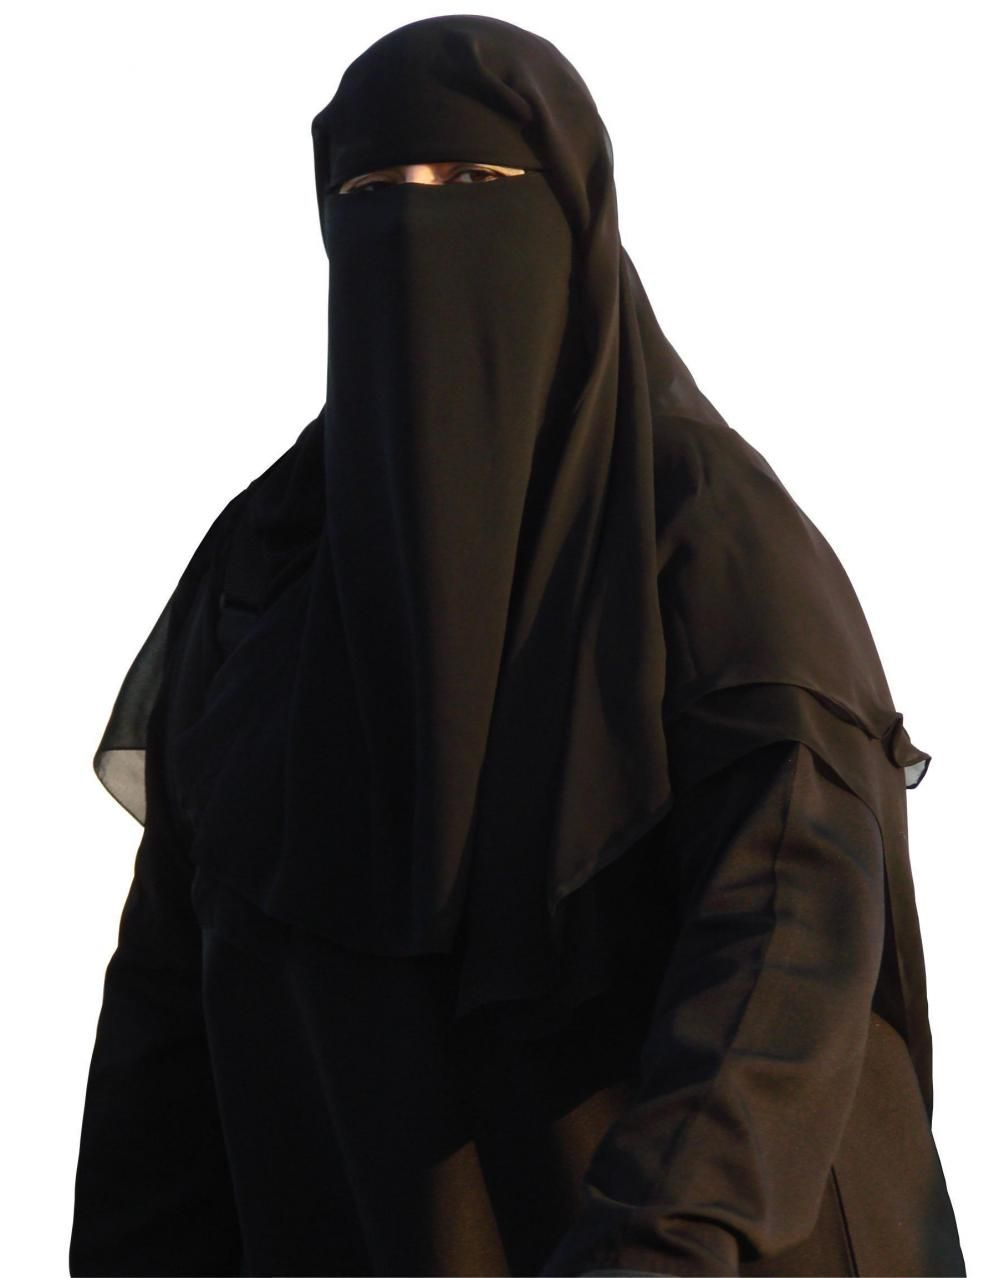 woman in burka - Google Search